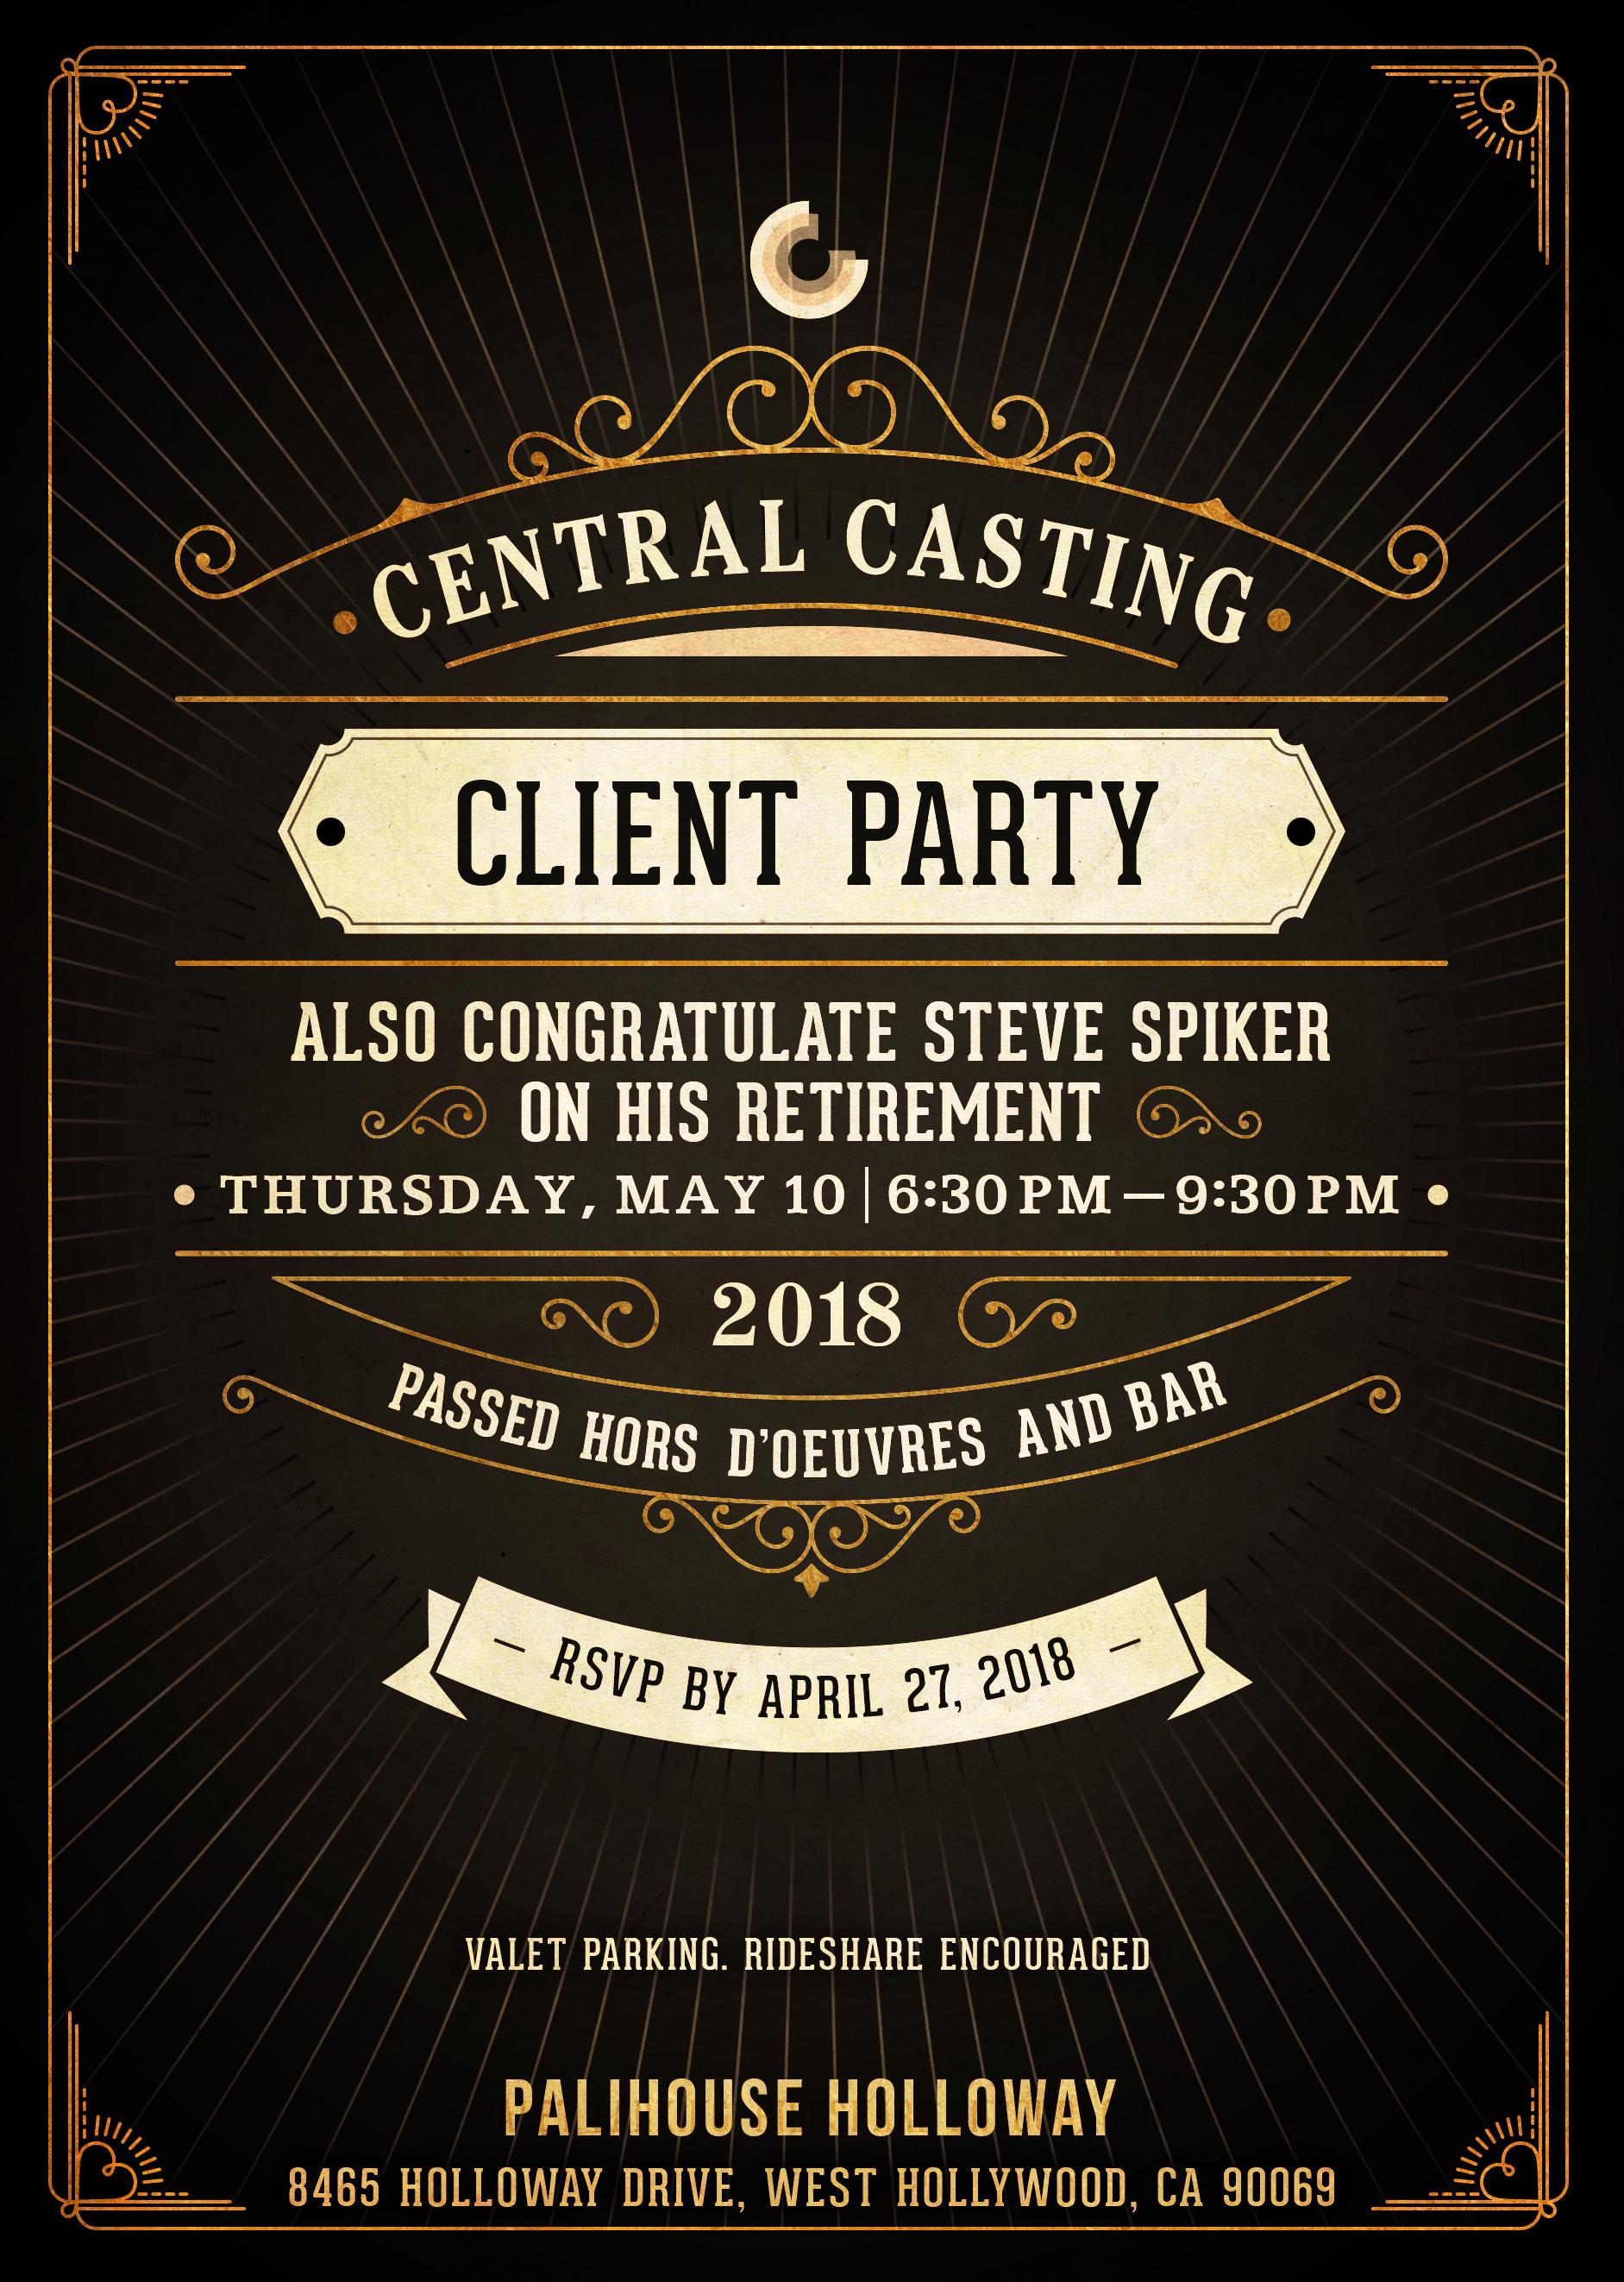 cc_party invitation2018_v3.jpg